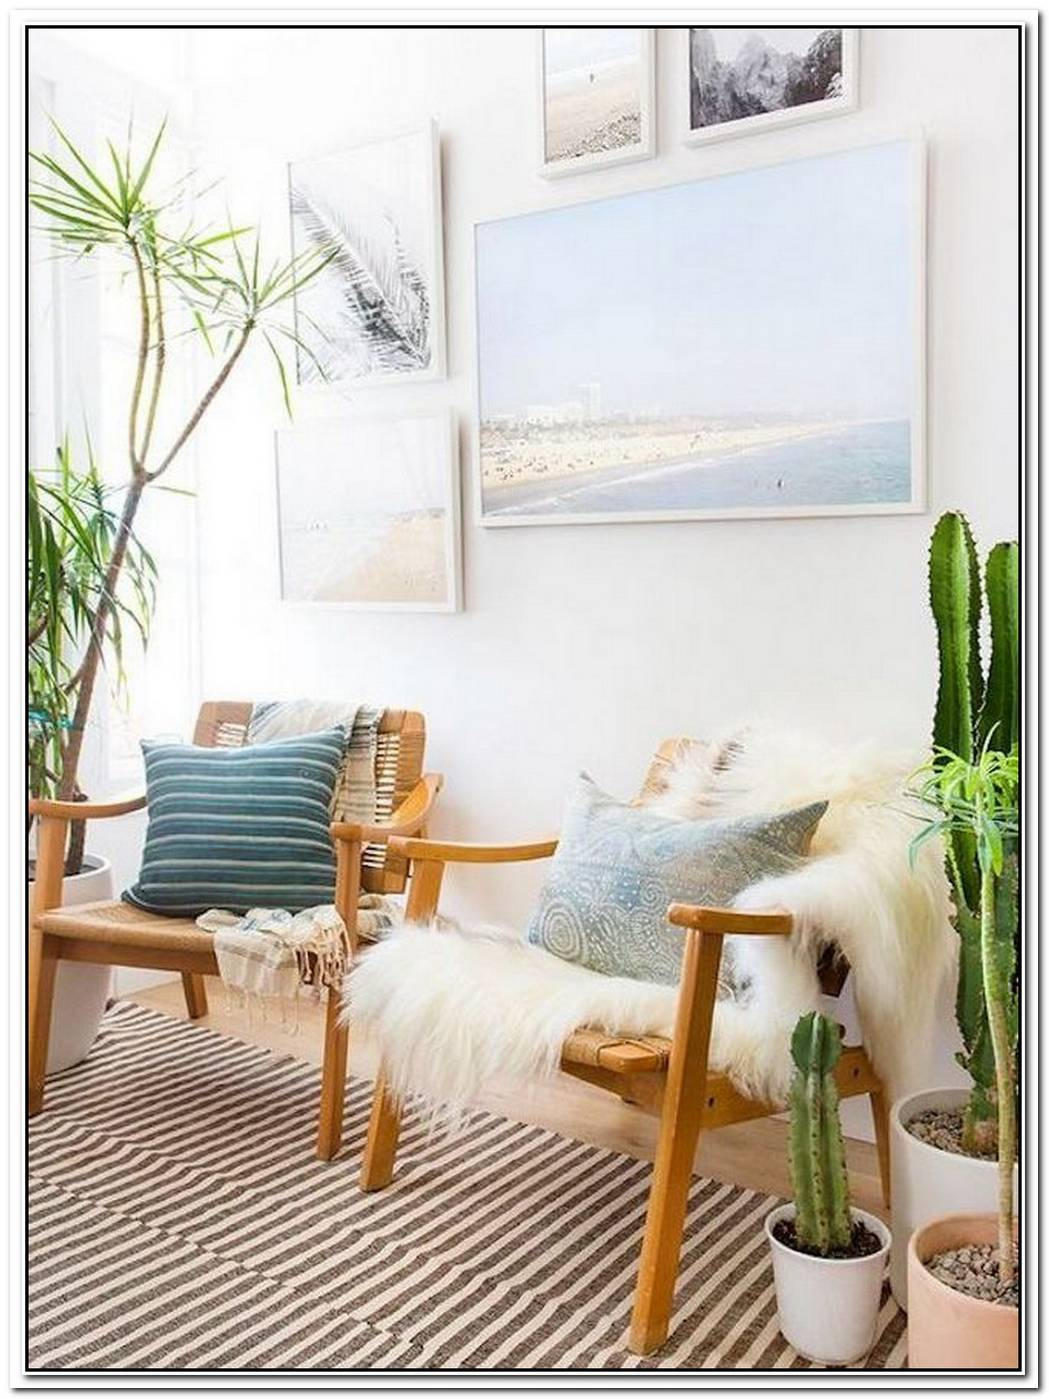 Desert Chic Meets Minimalism In This Cozy Bedroom